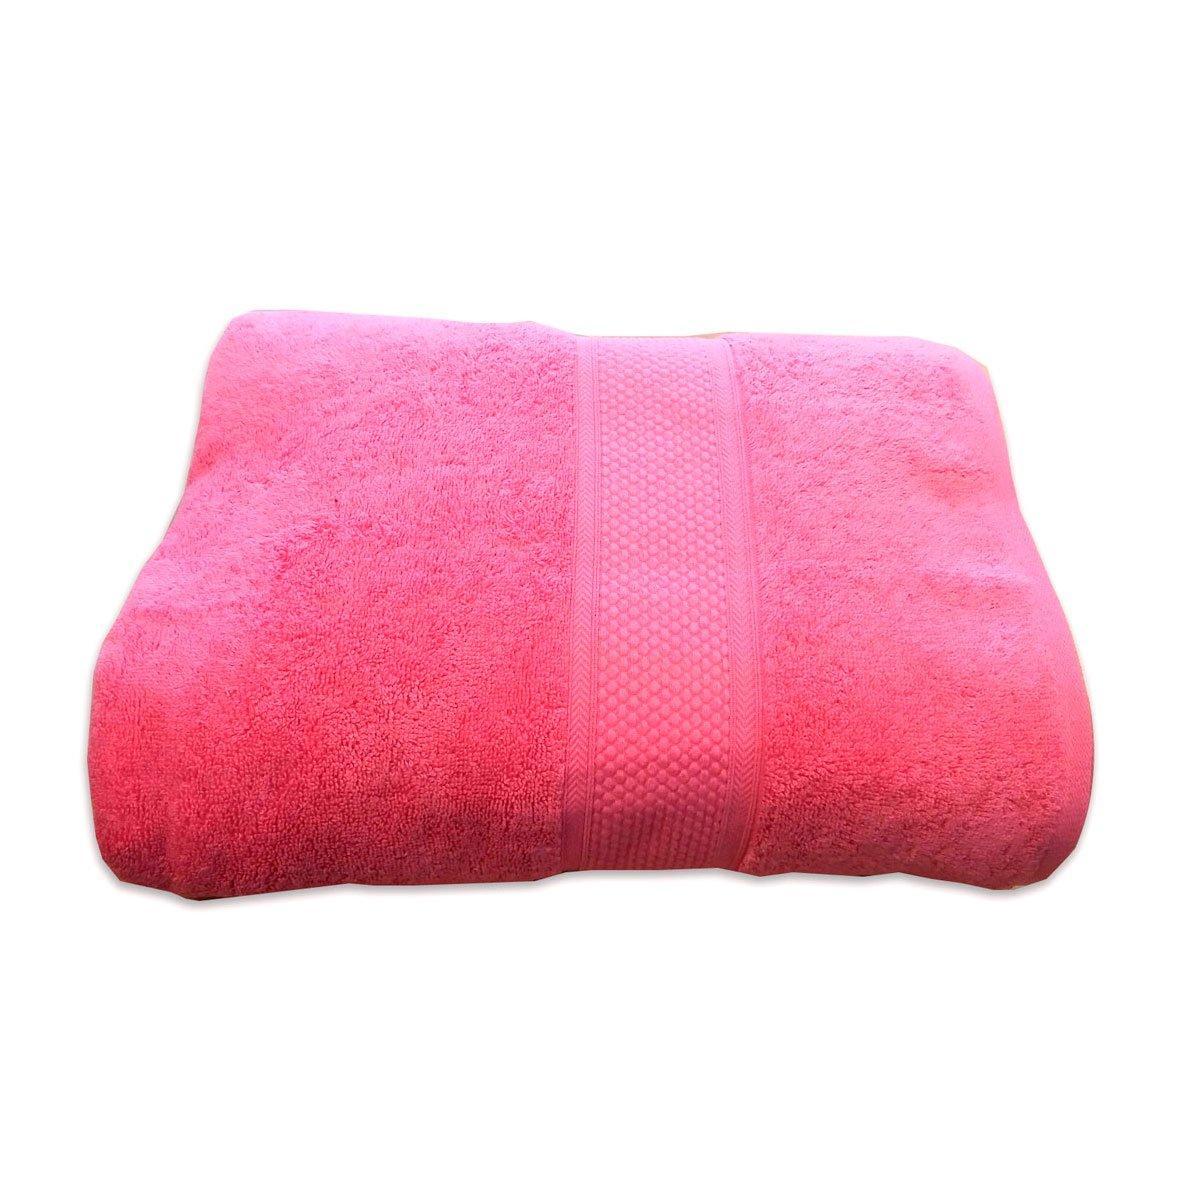 Juegos De Baño Sears: toalla de baño rosa 90×160 toalla de baño rosa 90×160 compartir en